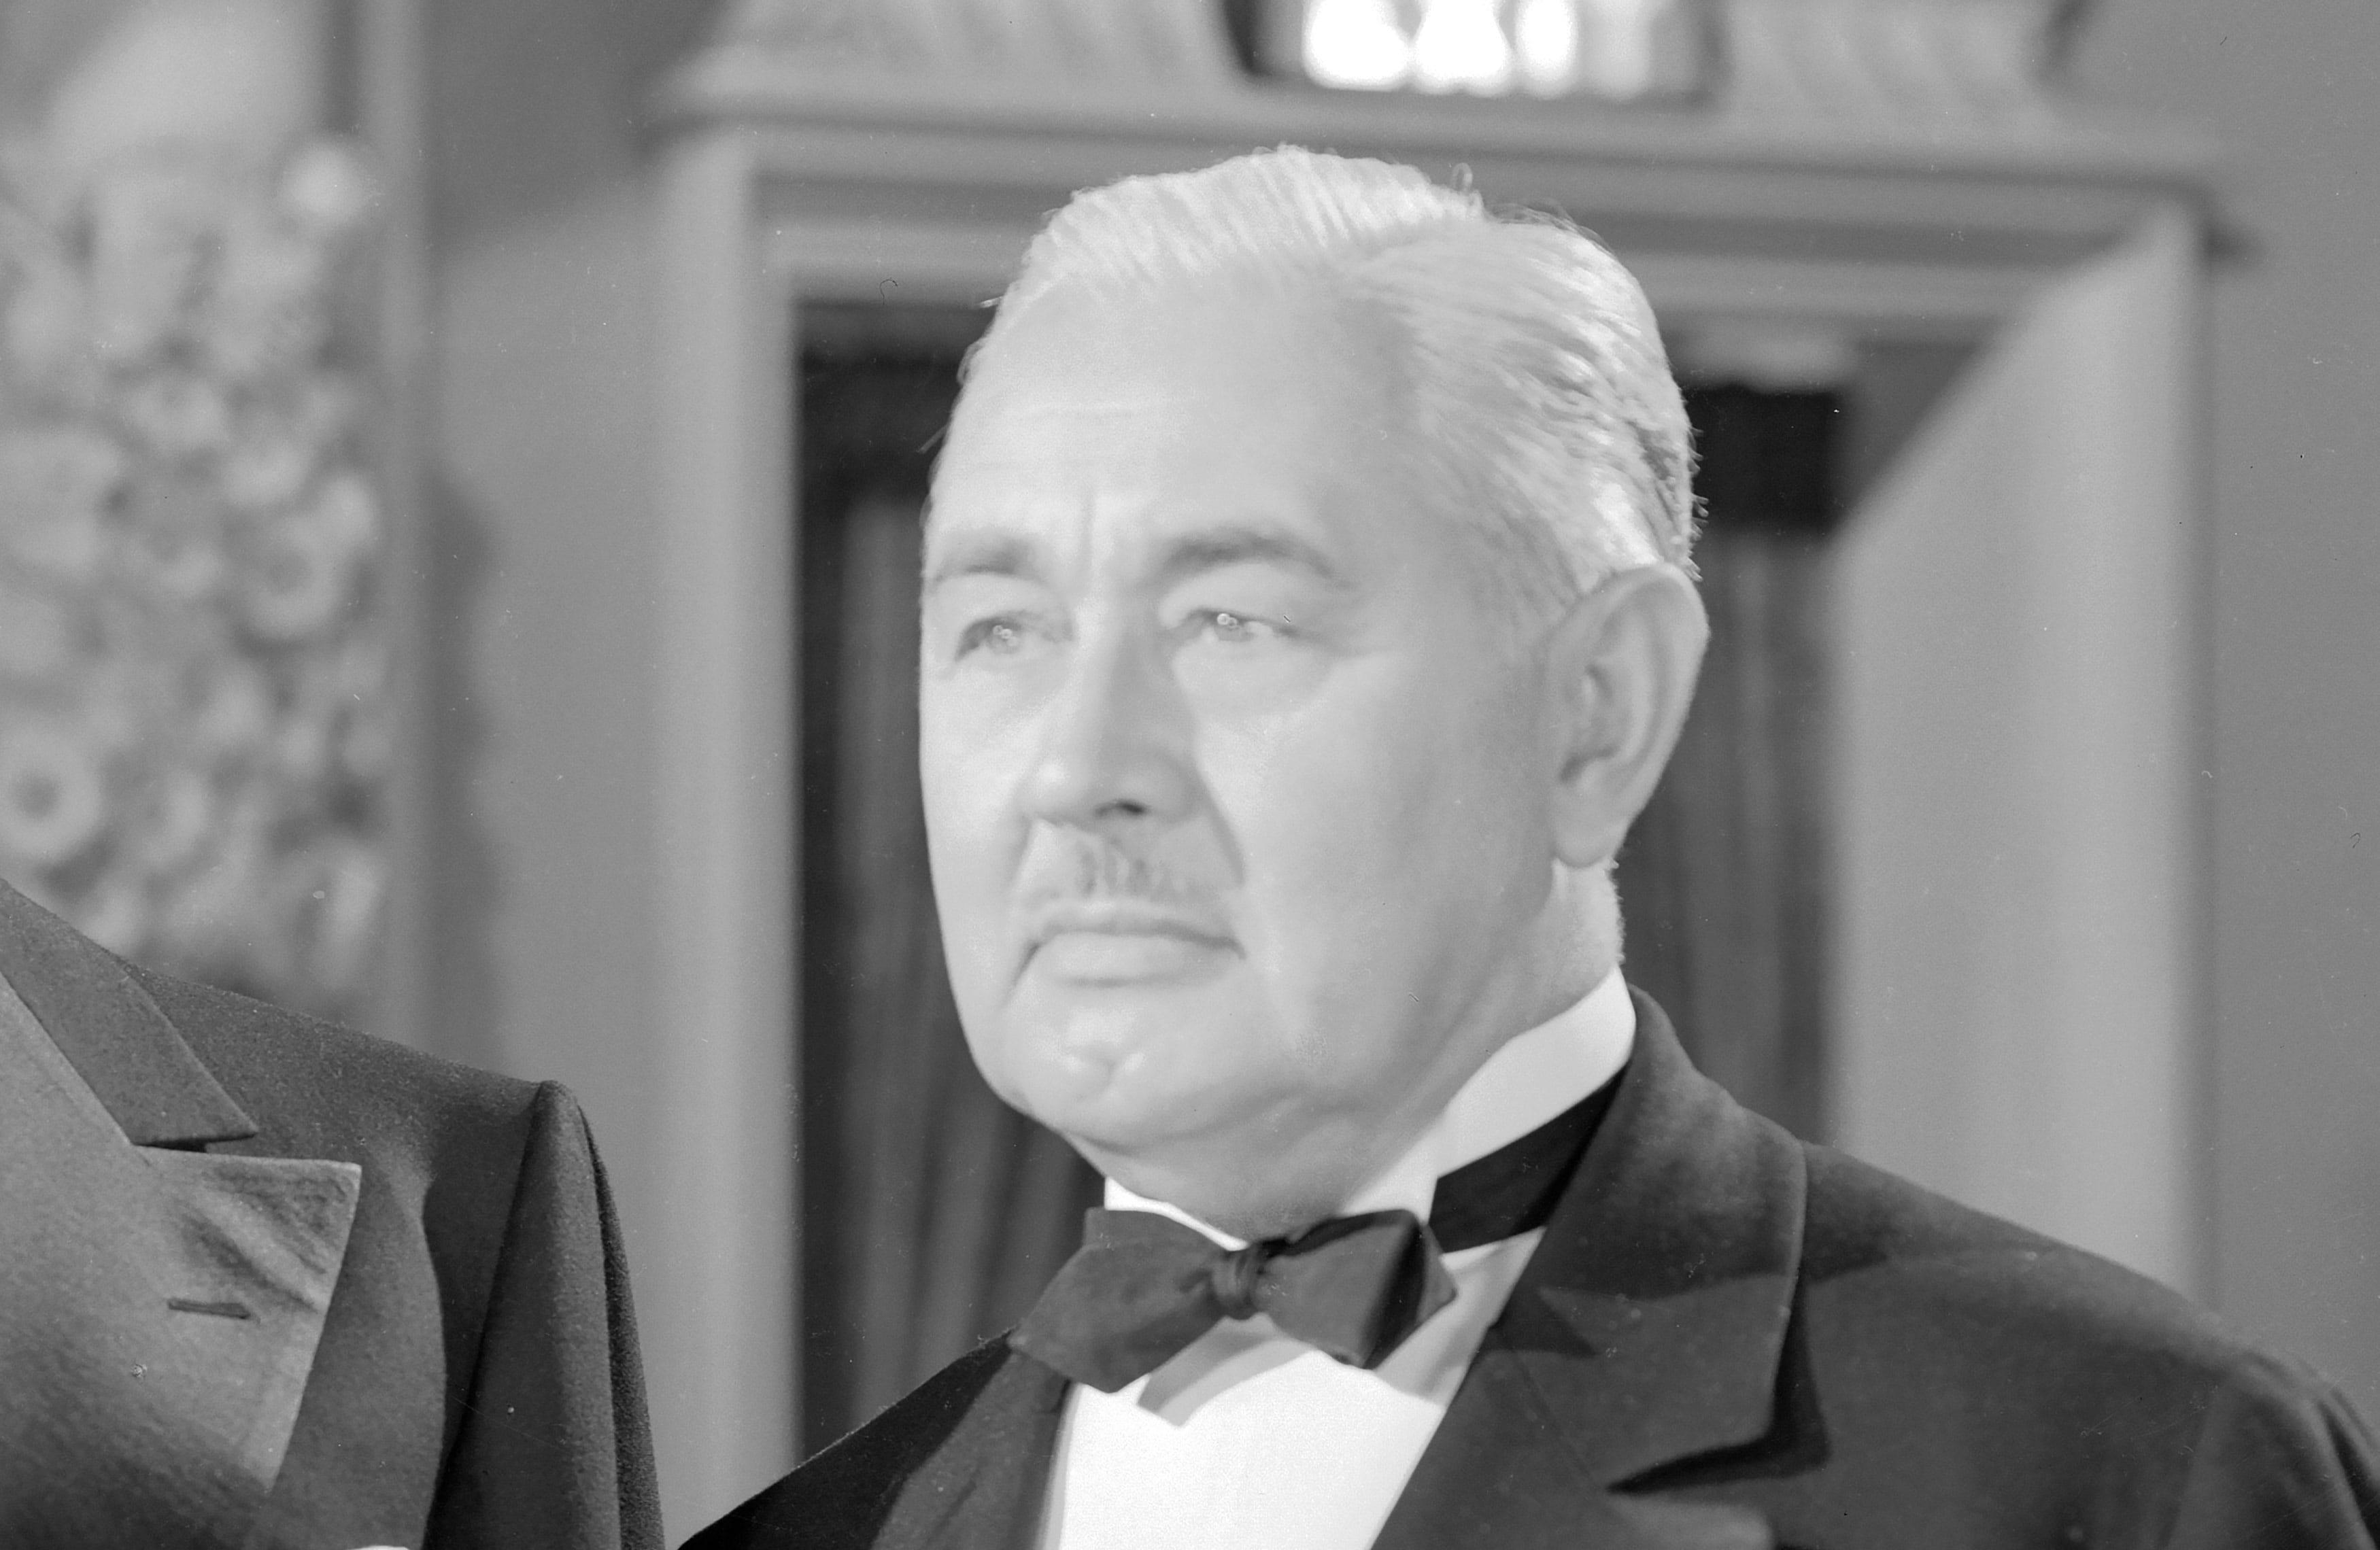 Clyde Fillmore